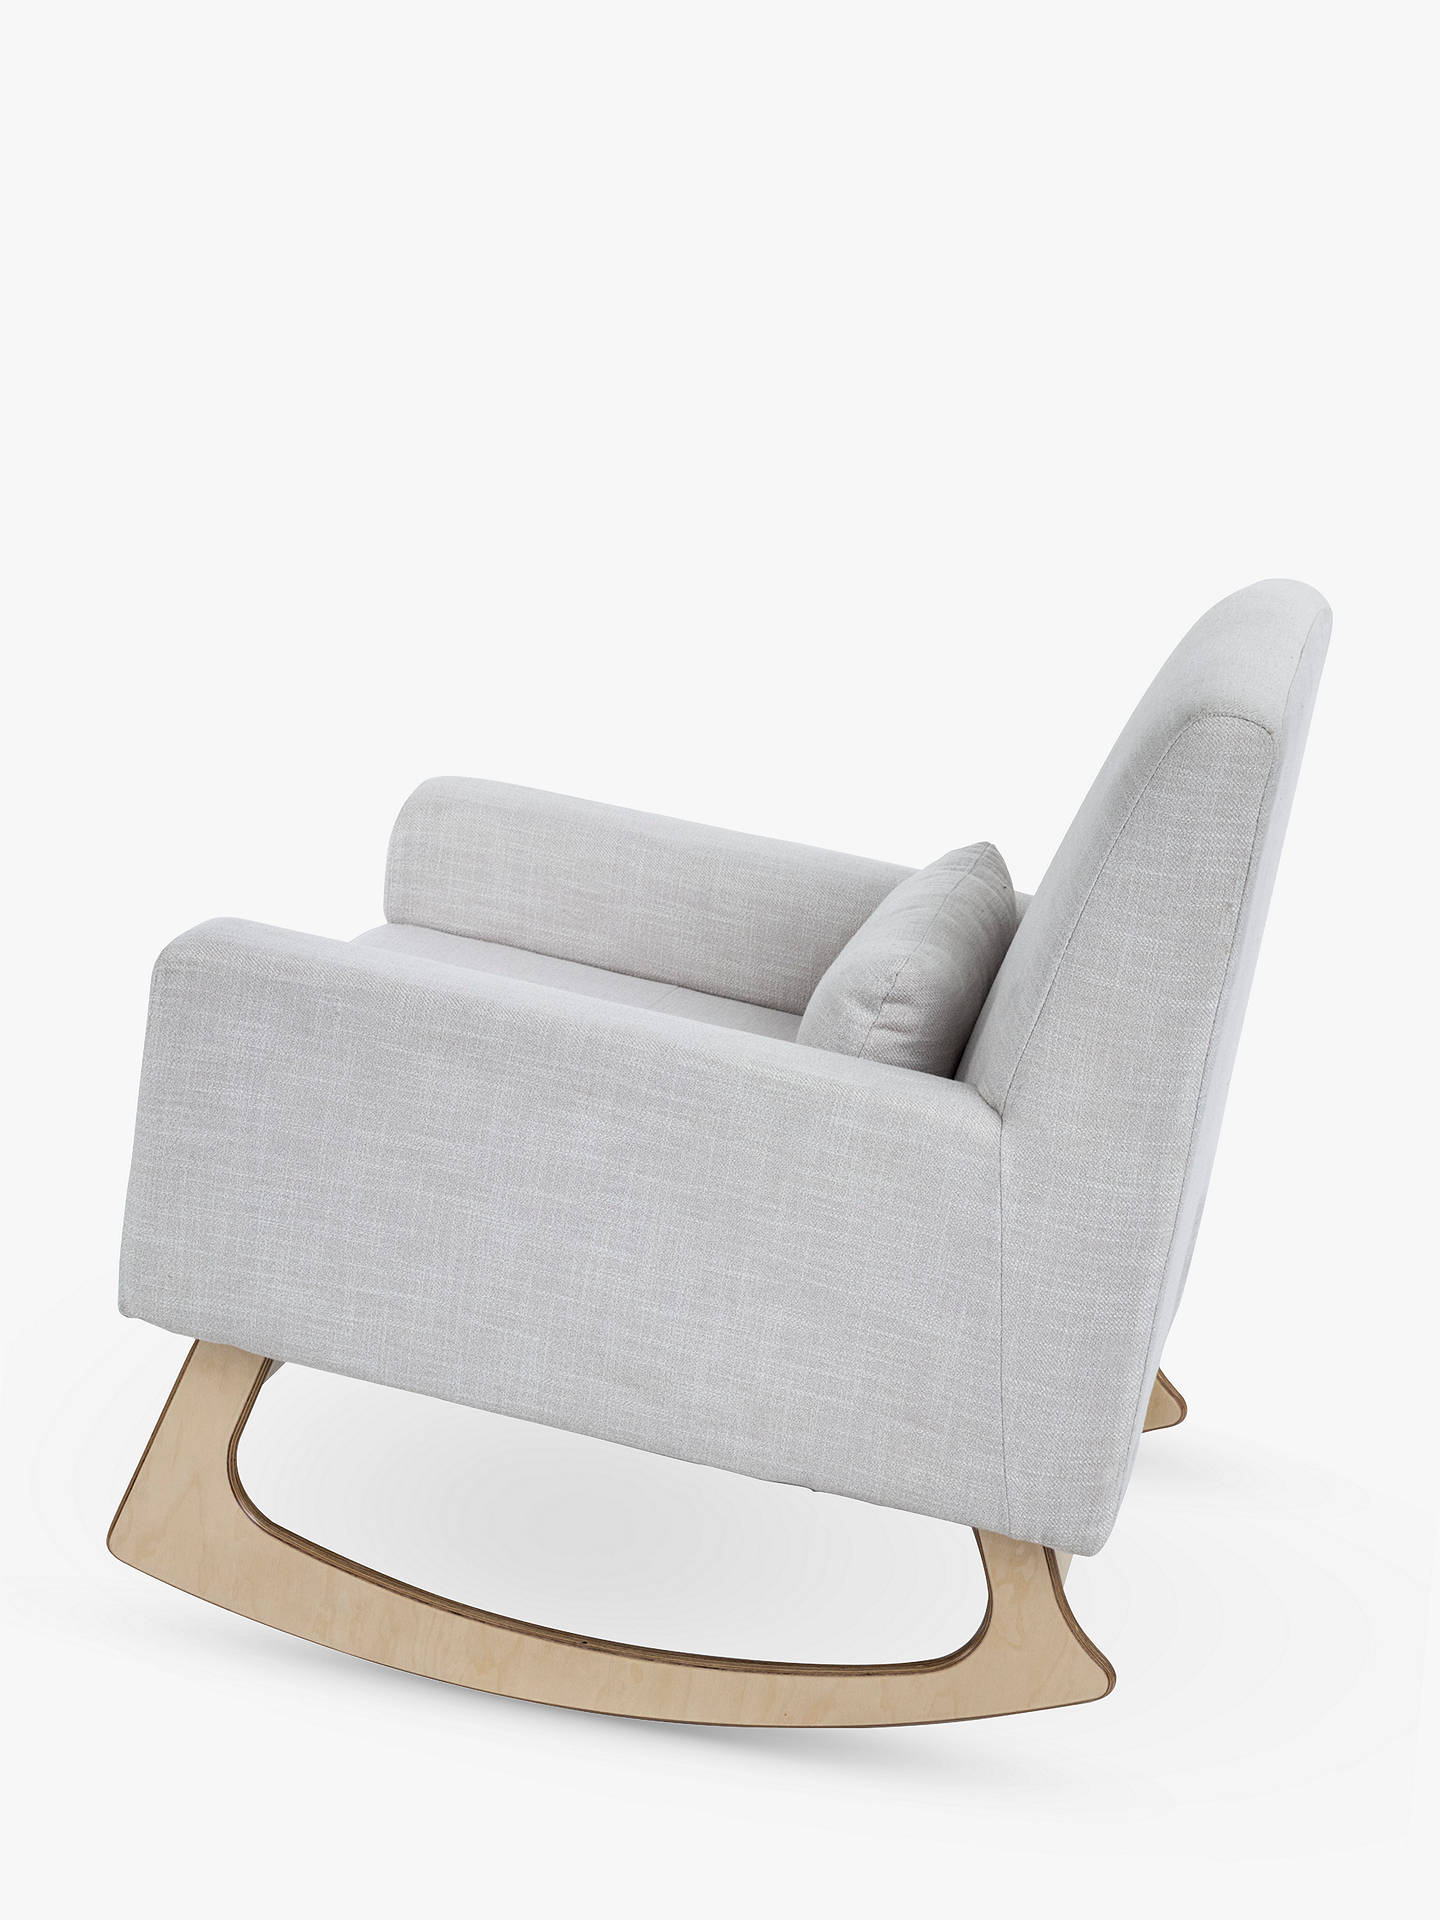 Astounding Gaia Baby Serena Nursing Rocking Chair Oat Gamerscity Chair Design For Home Gamerscityorg